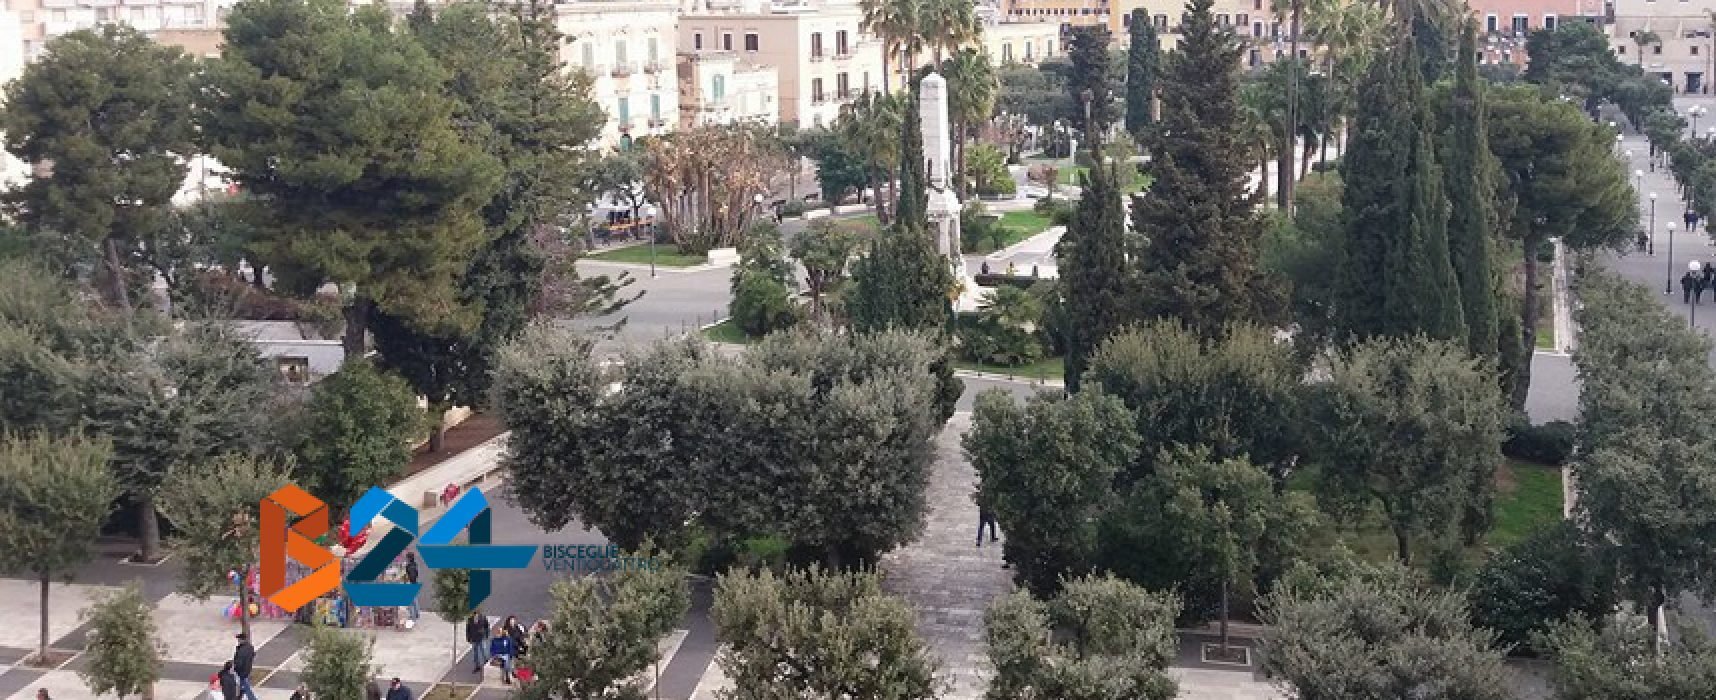 Droga: pusher 20enne arrestato dai carabinieri in piazza Vittorio Emanuele